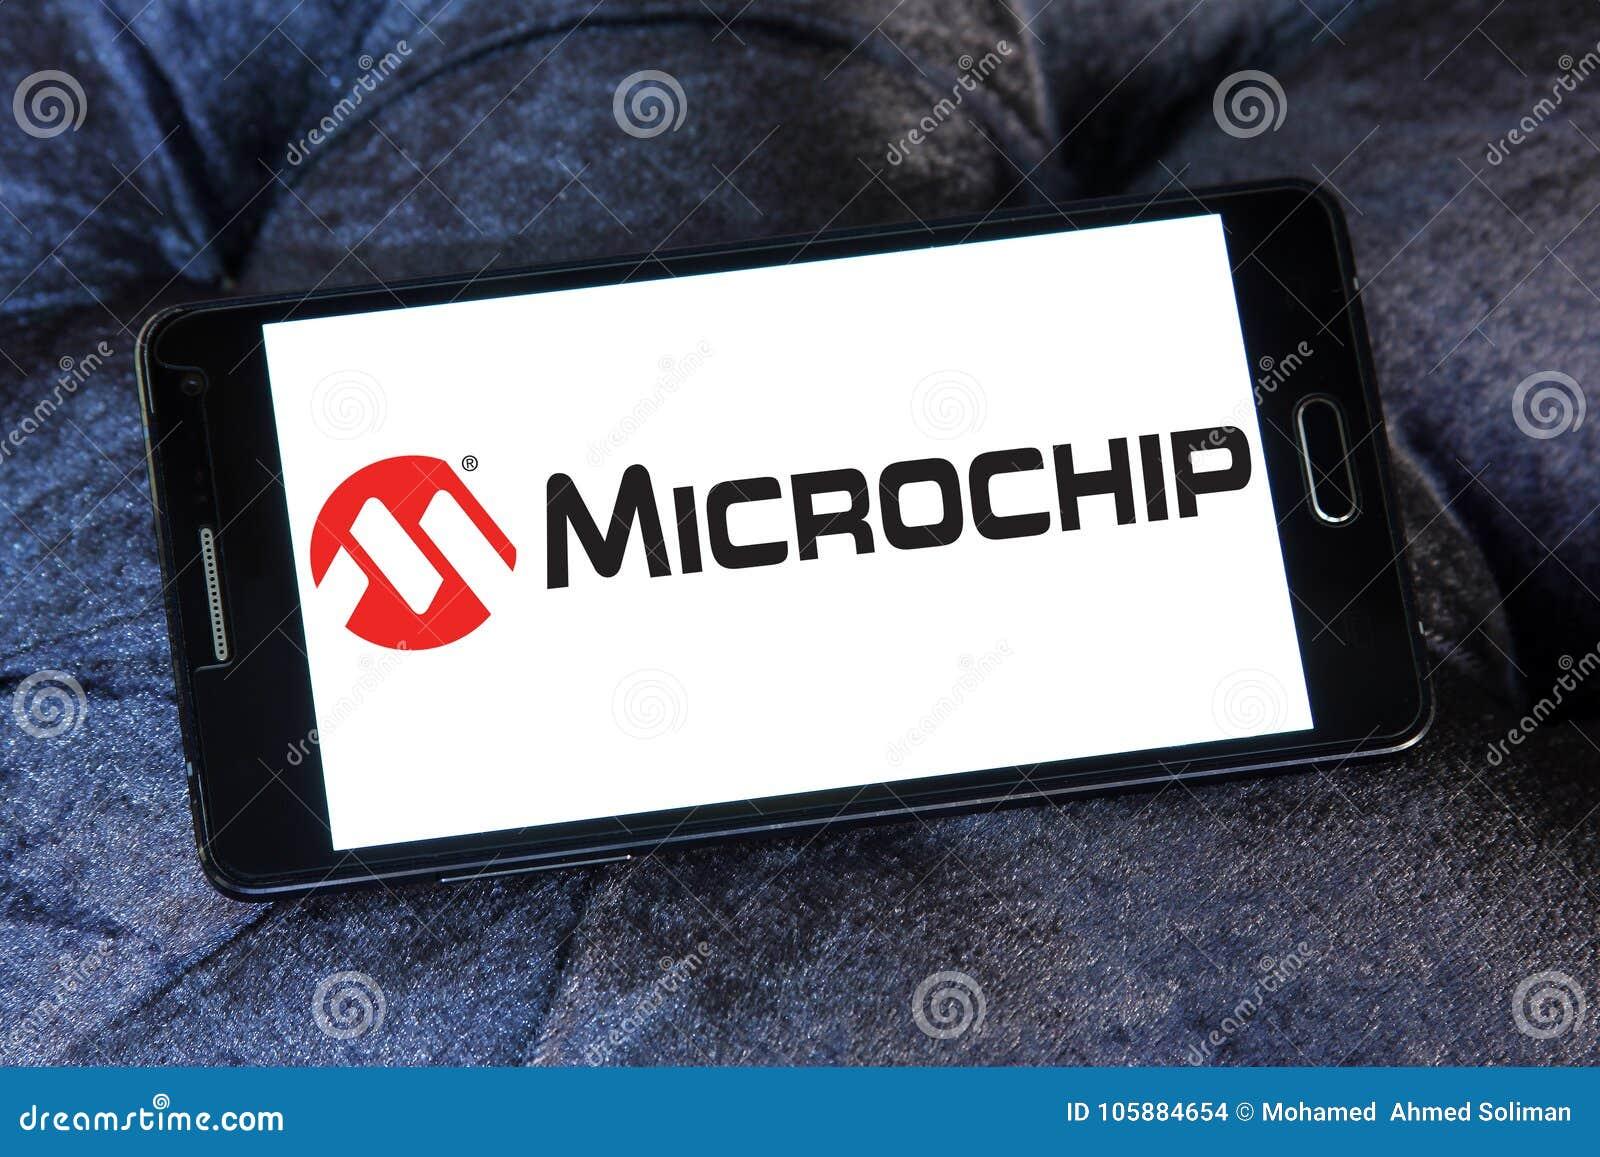 Microchip Technology Company Logo Editorial Stock Image